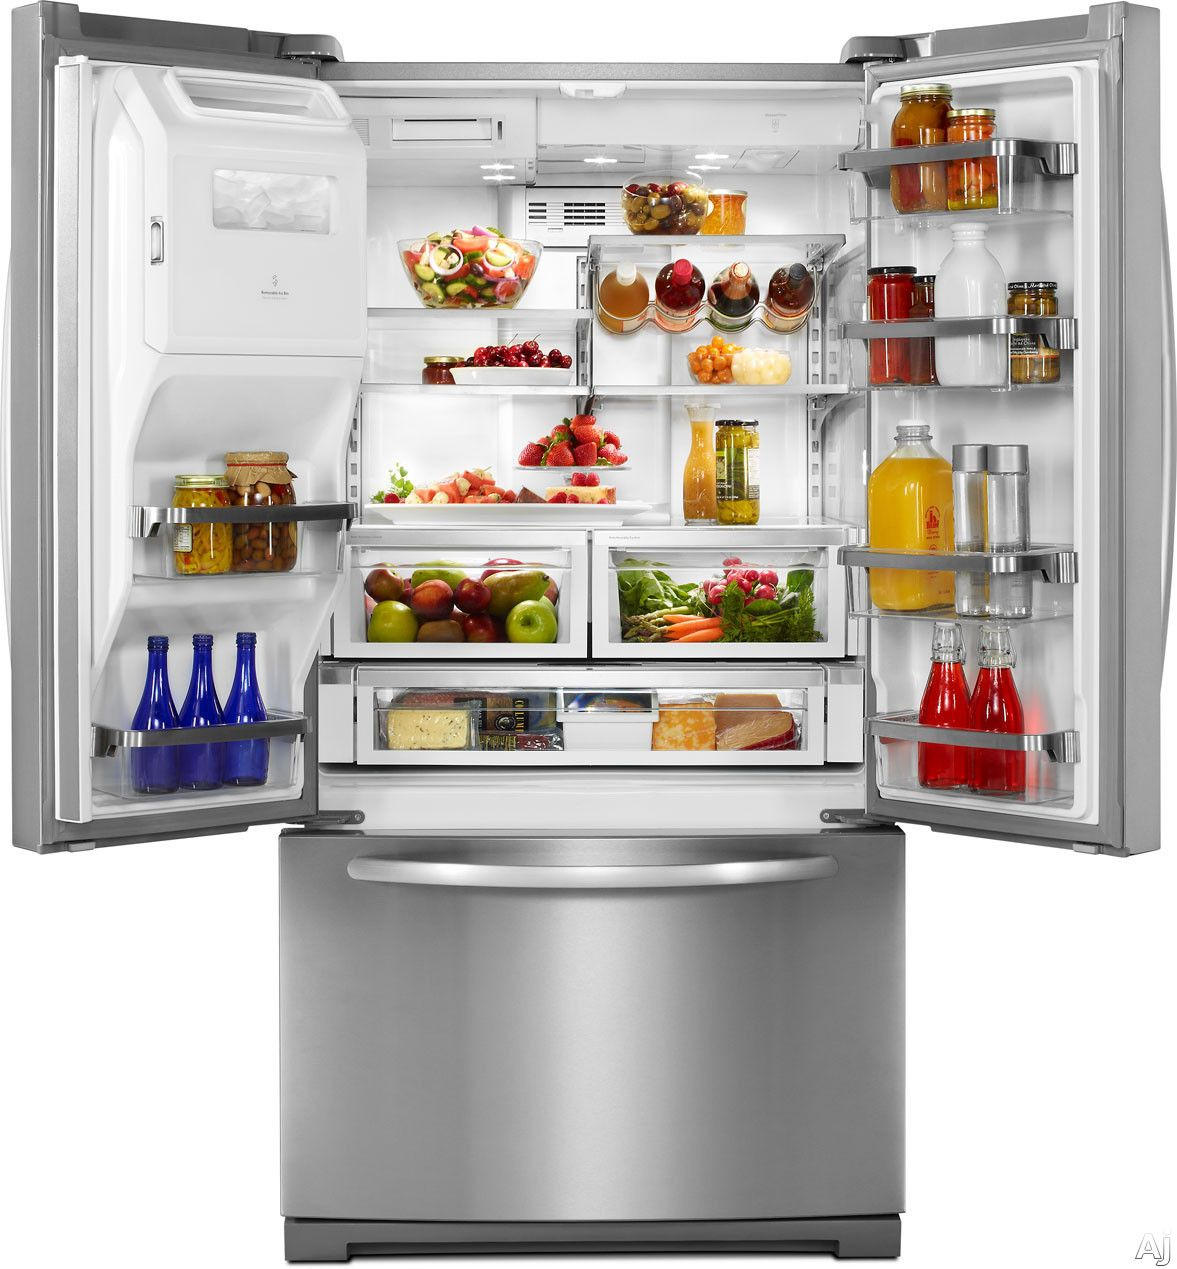 Kitchenaid Kfis29pbms 28 6 Cu Ft French Door Refrigerator With Spillclean Glass Shelves Auto Humidity Crispe Stainless Refrigerator Fridge Decor Kitchen Aid